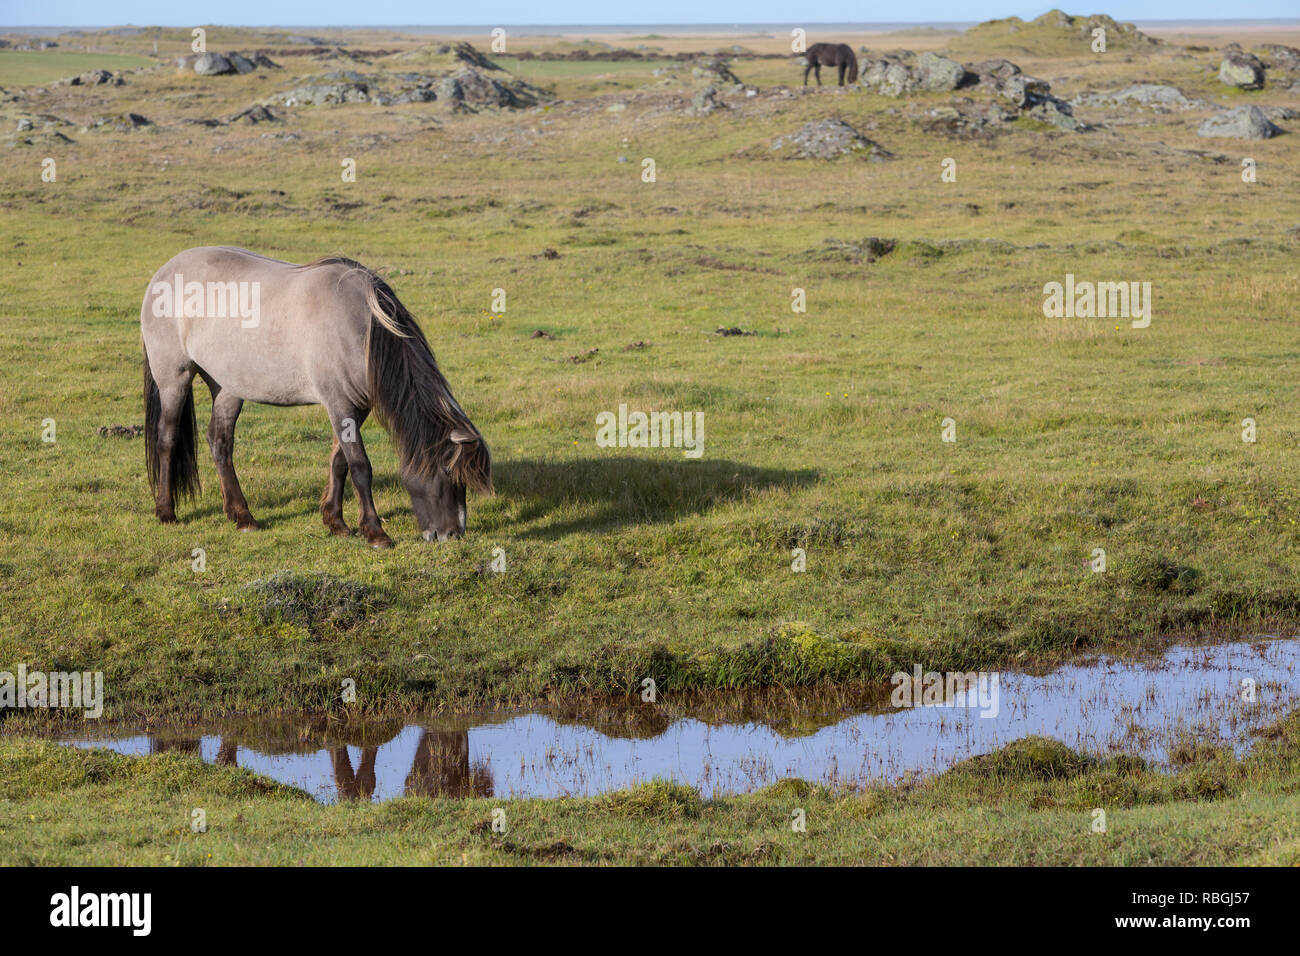 Islandpferd, Isländer, Islandpony, Island-Pferd, Isländer, Island-Pony, Pony, Ponies, auf Island, Icelandic horse, Iceland, L'islandais, Islandais - Stock Image